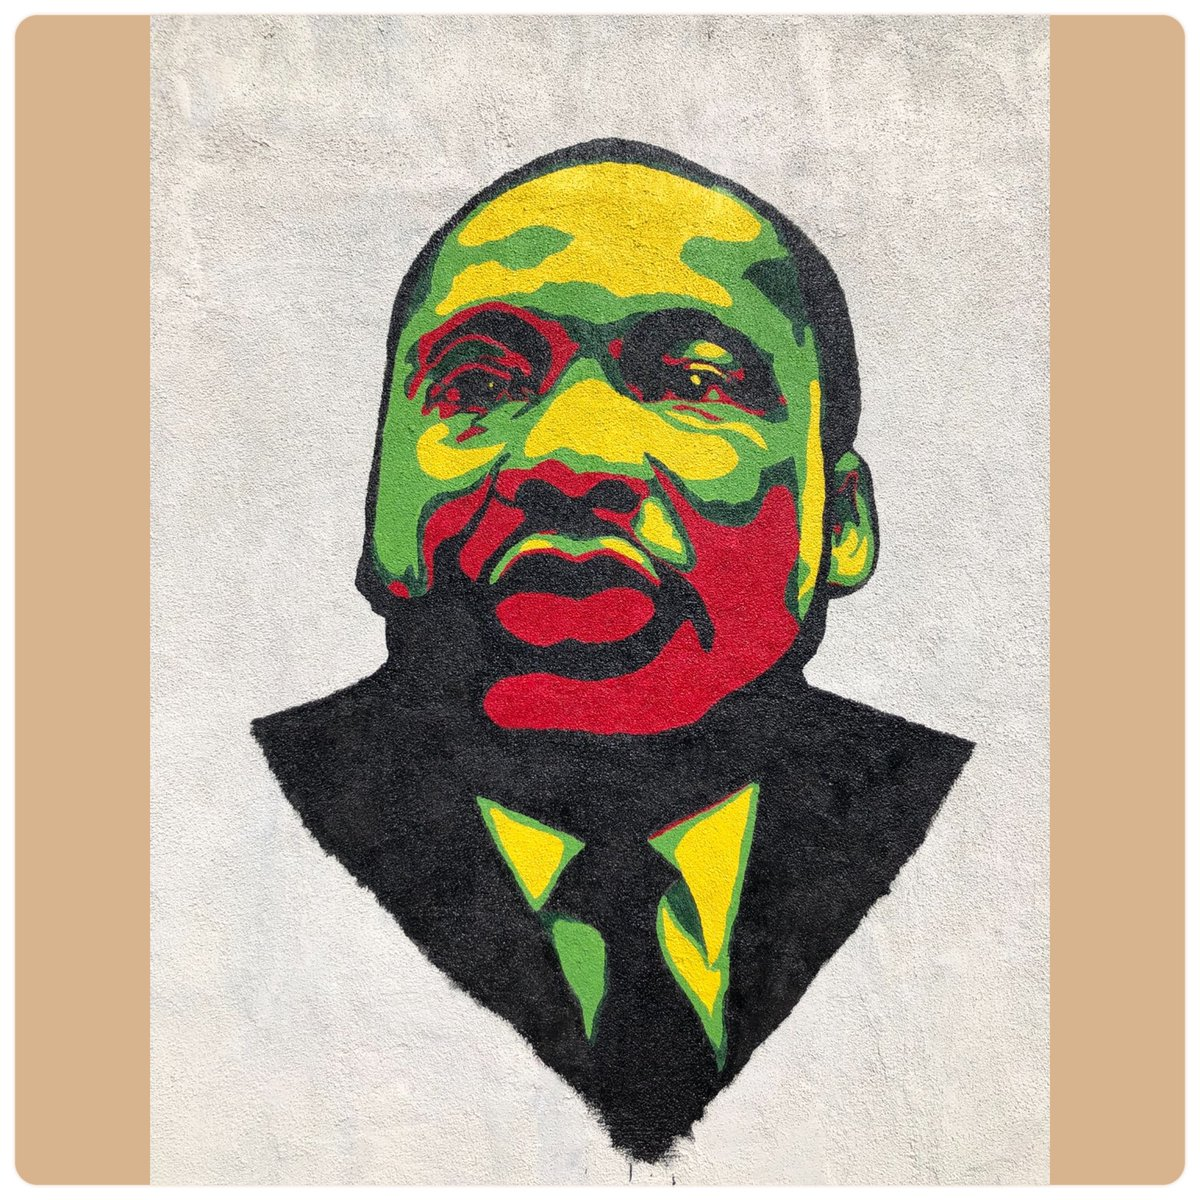 ☮️💙#Happy #MLKDay #NeverForget